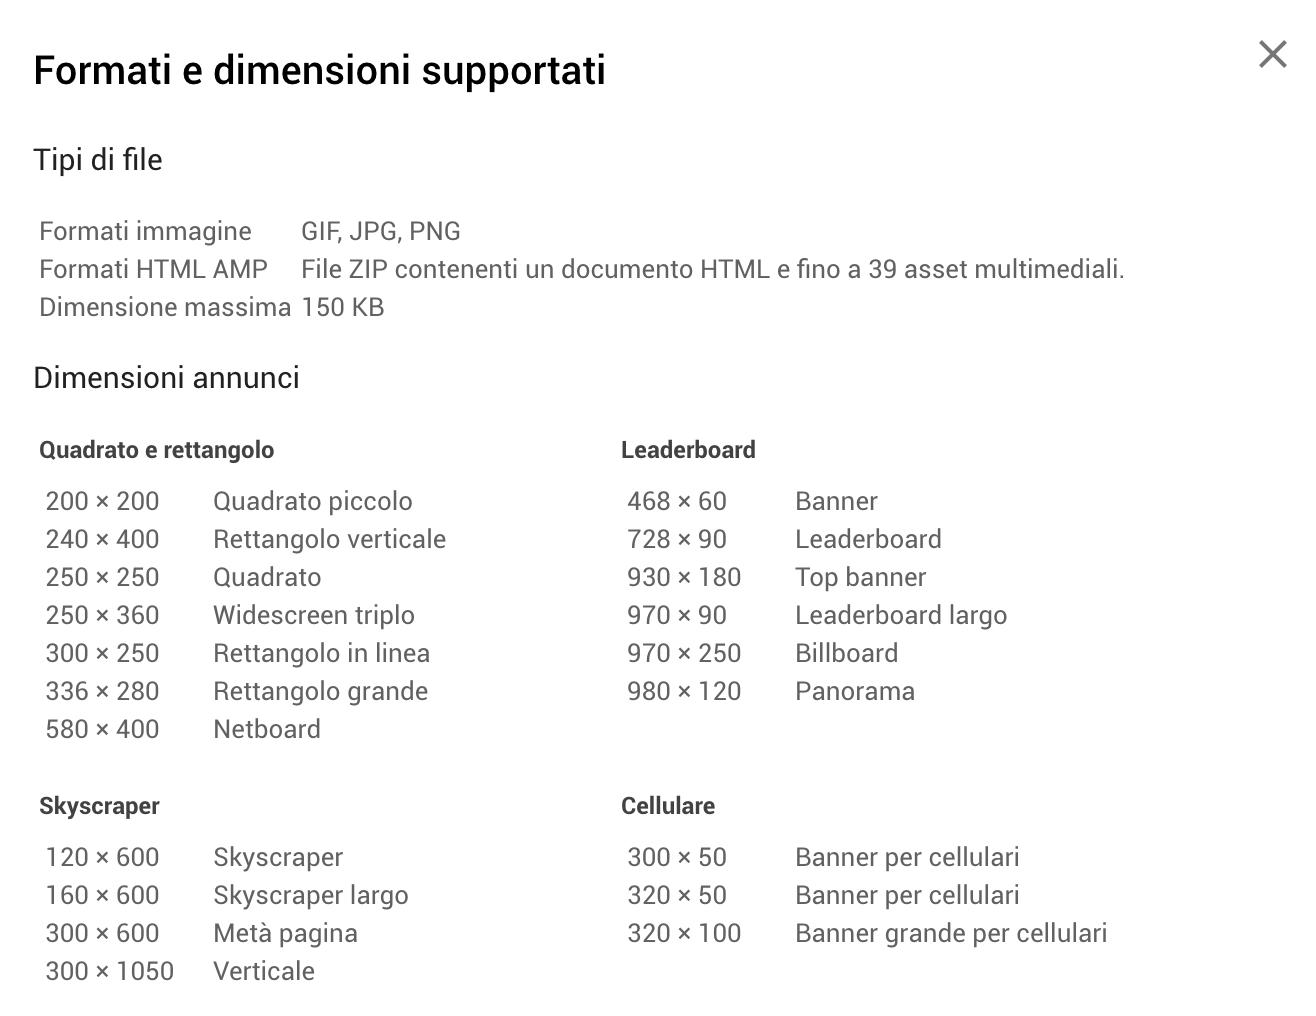 Formati-GoogleADS